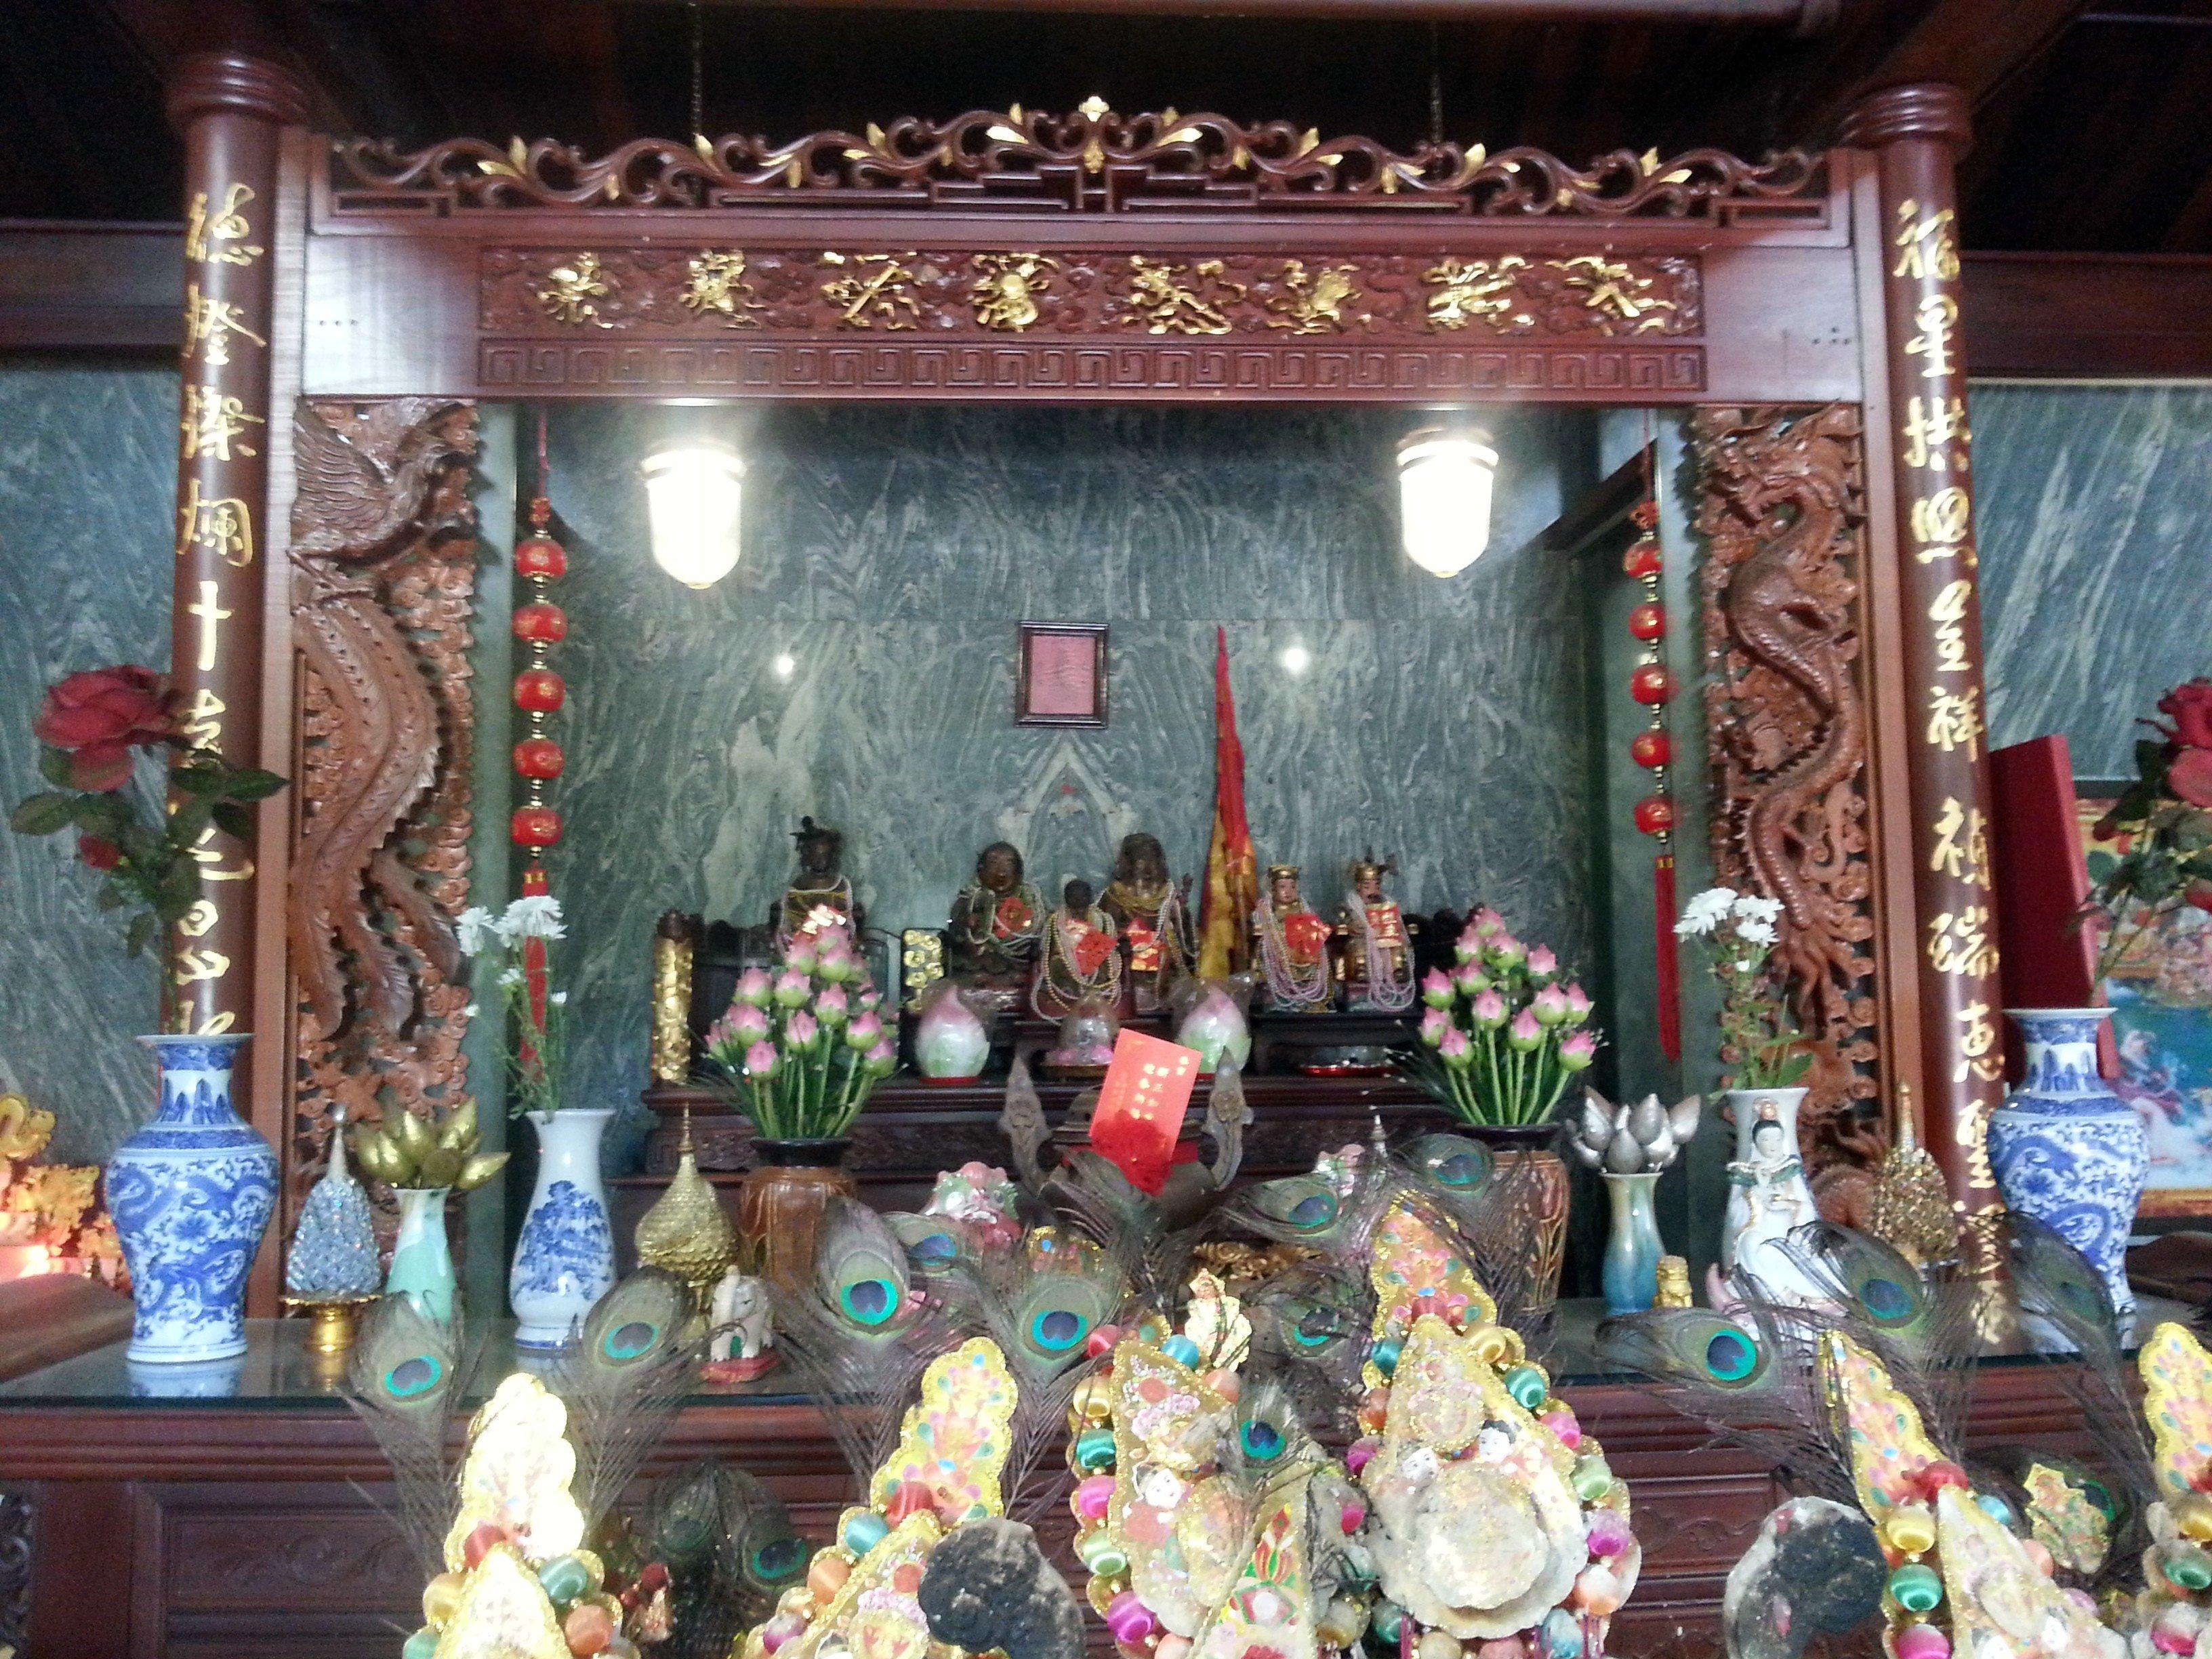 Altar at Fude Miao Temple in Vientiane